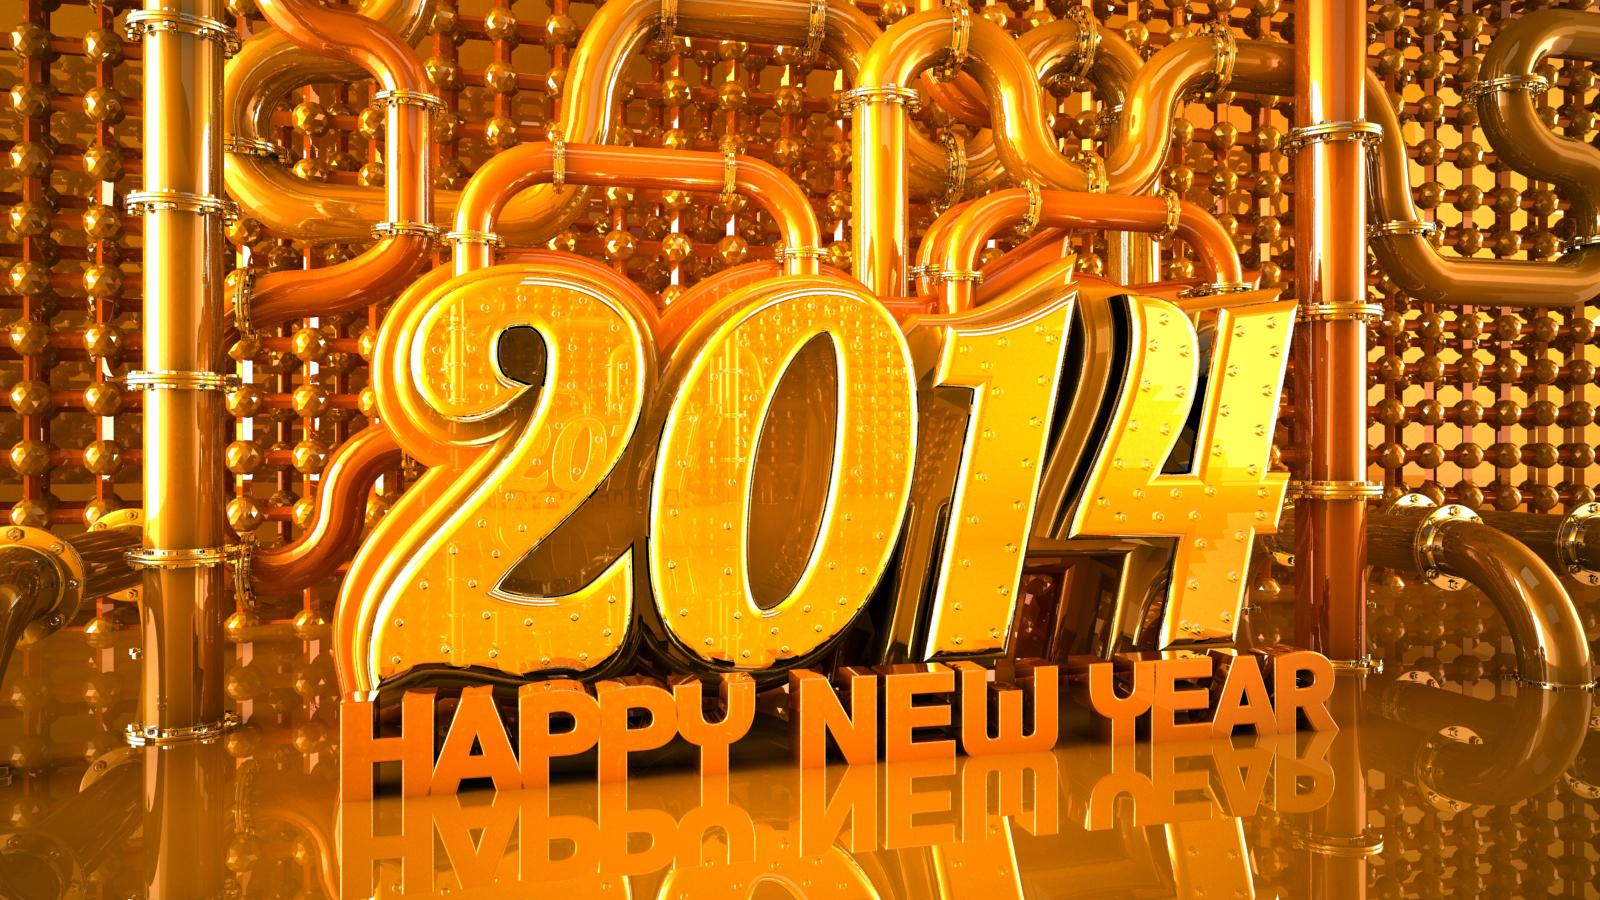 happy new year 2014 tom spencer freelance designer